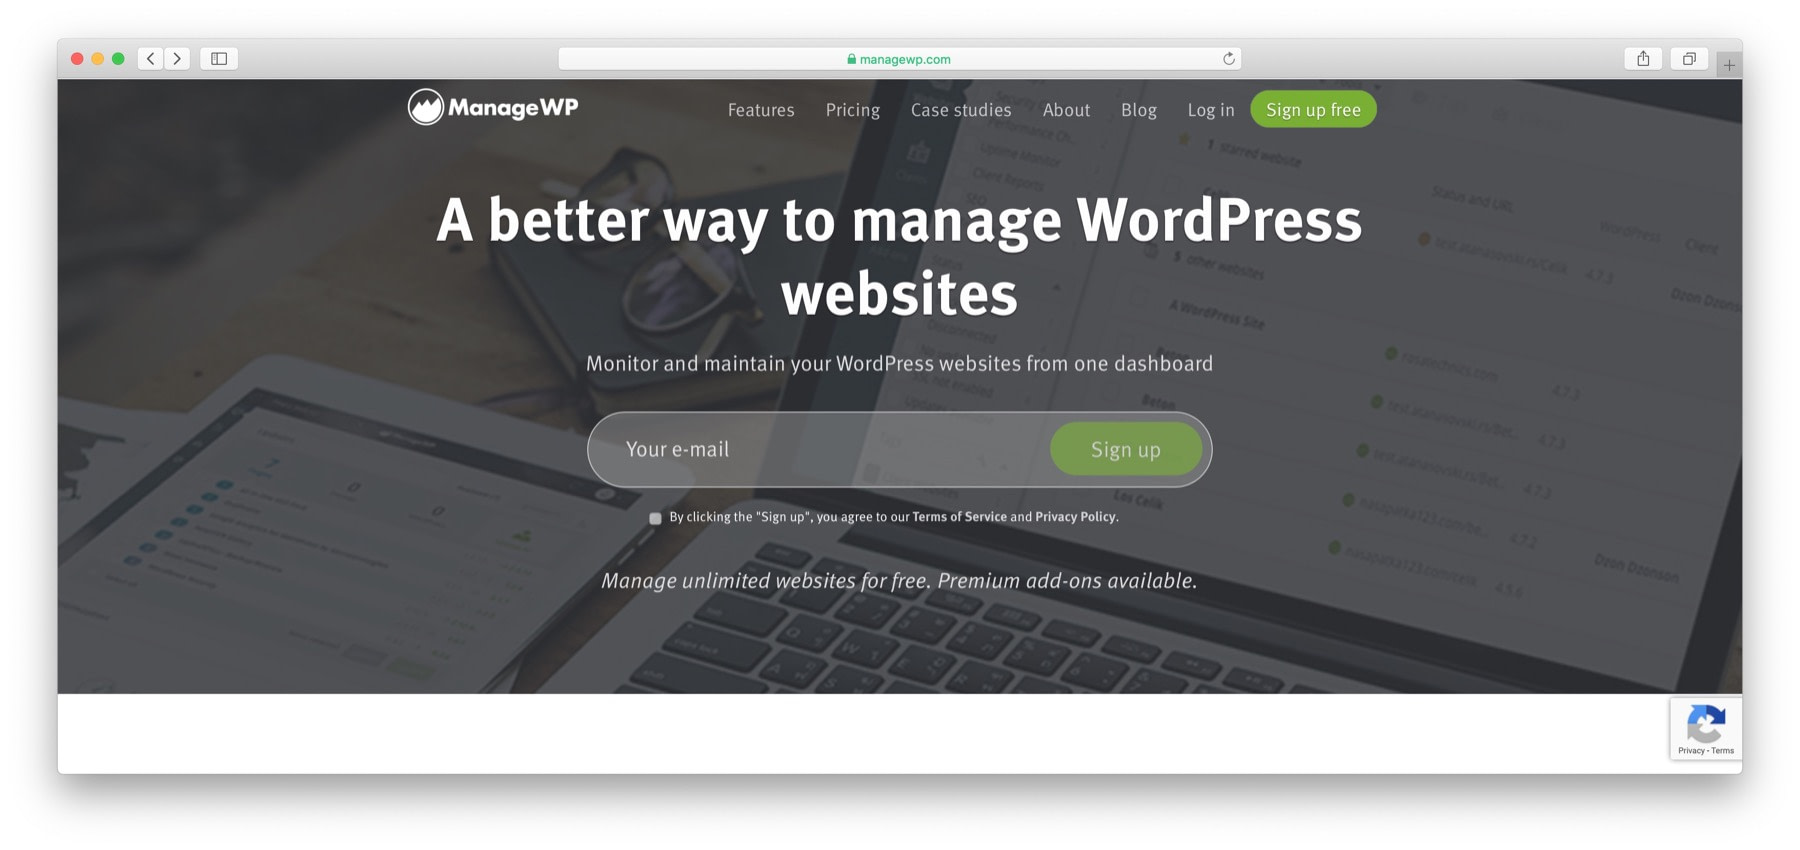 WordPress management tools: ManageWP